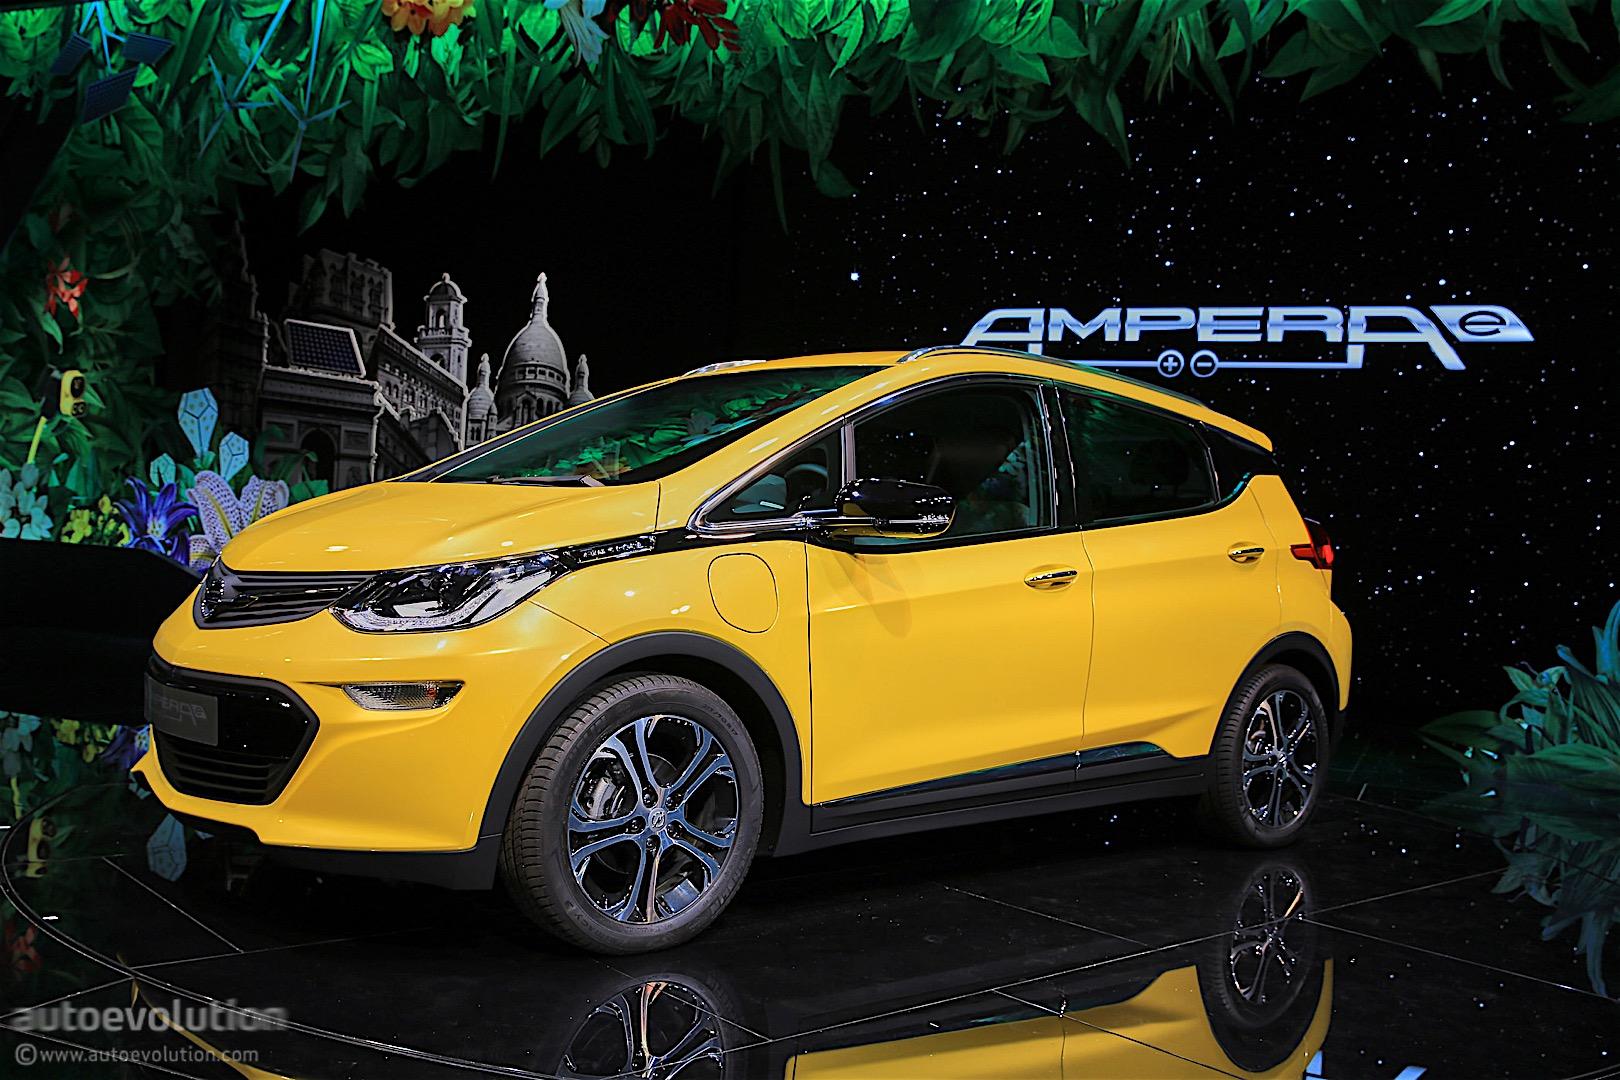 The 2017 Opel Ampera E Has Arrived In Paris Its Maximum Range Exceeds 500 Km Autoevolution